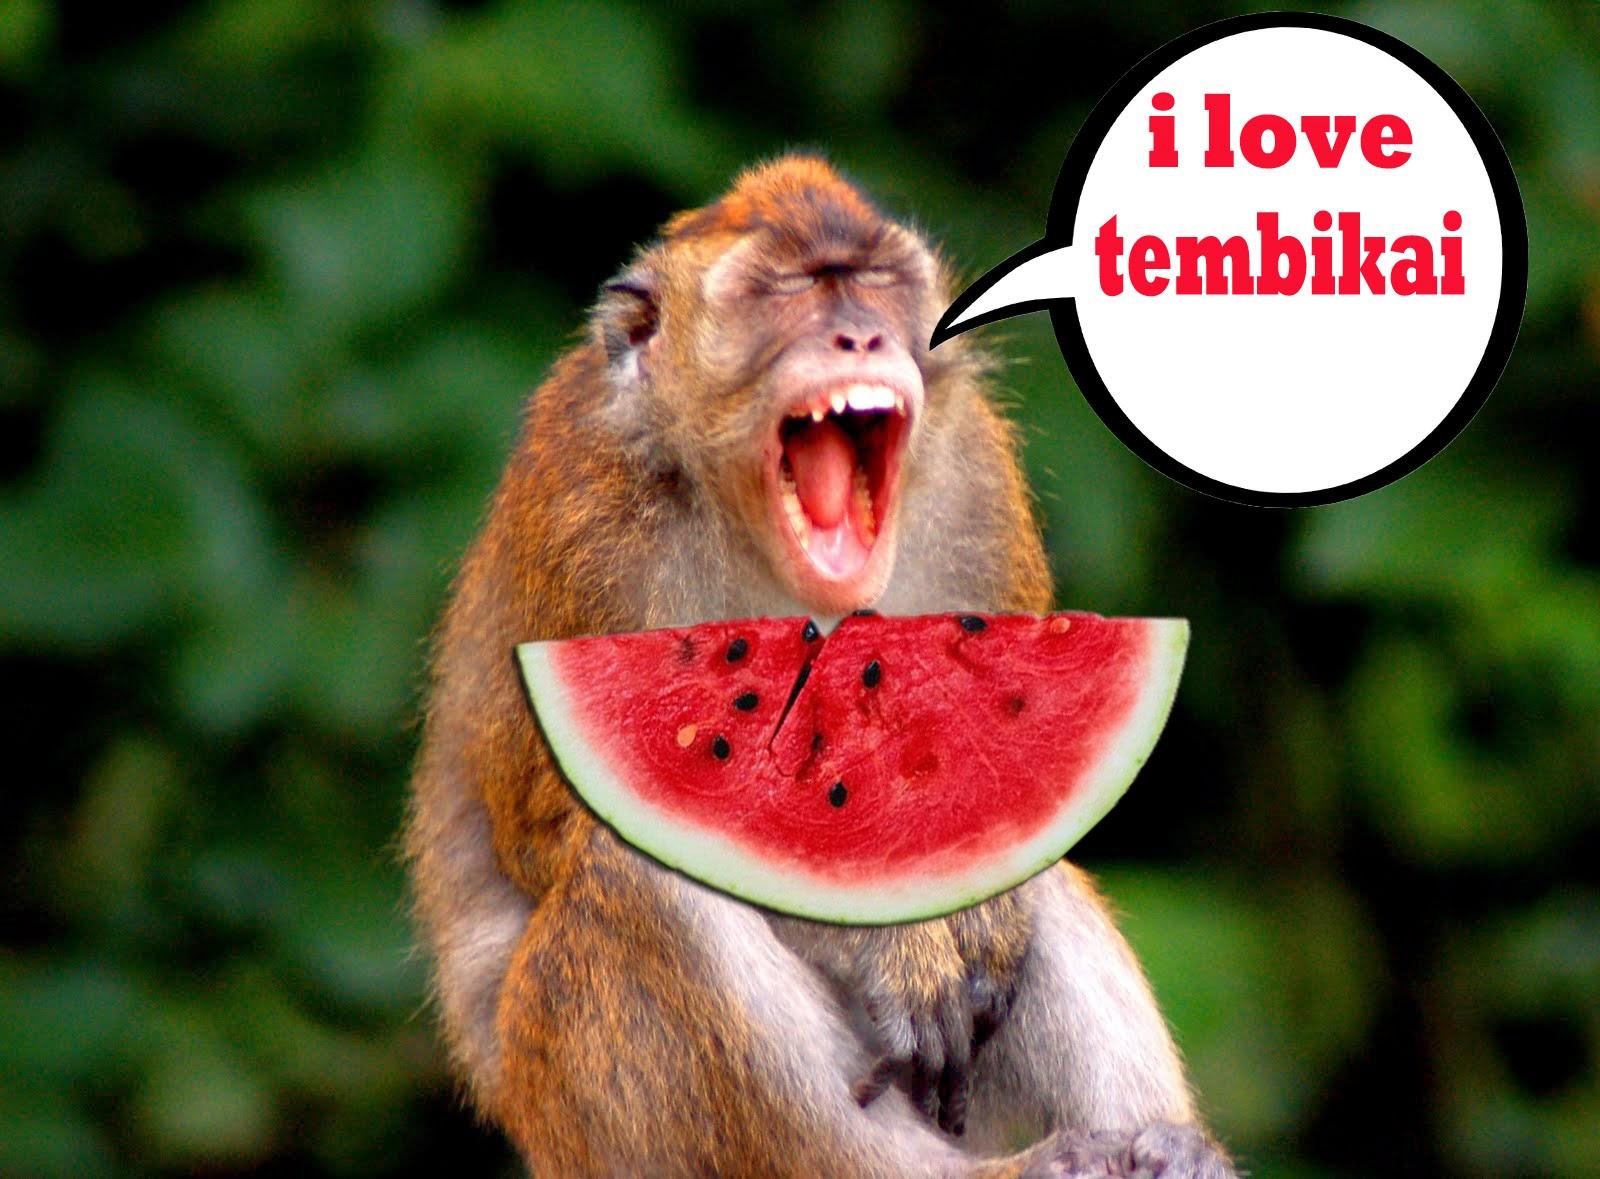 watermelon is good